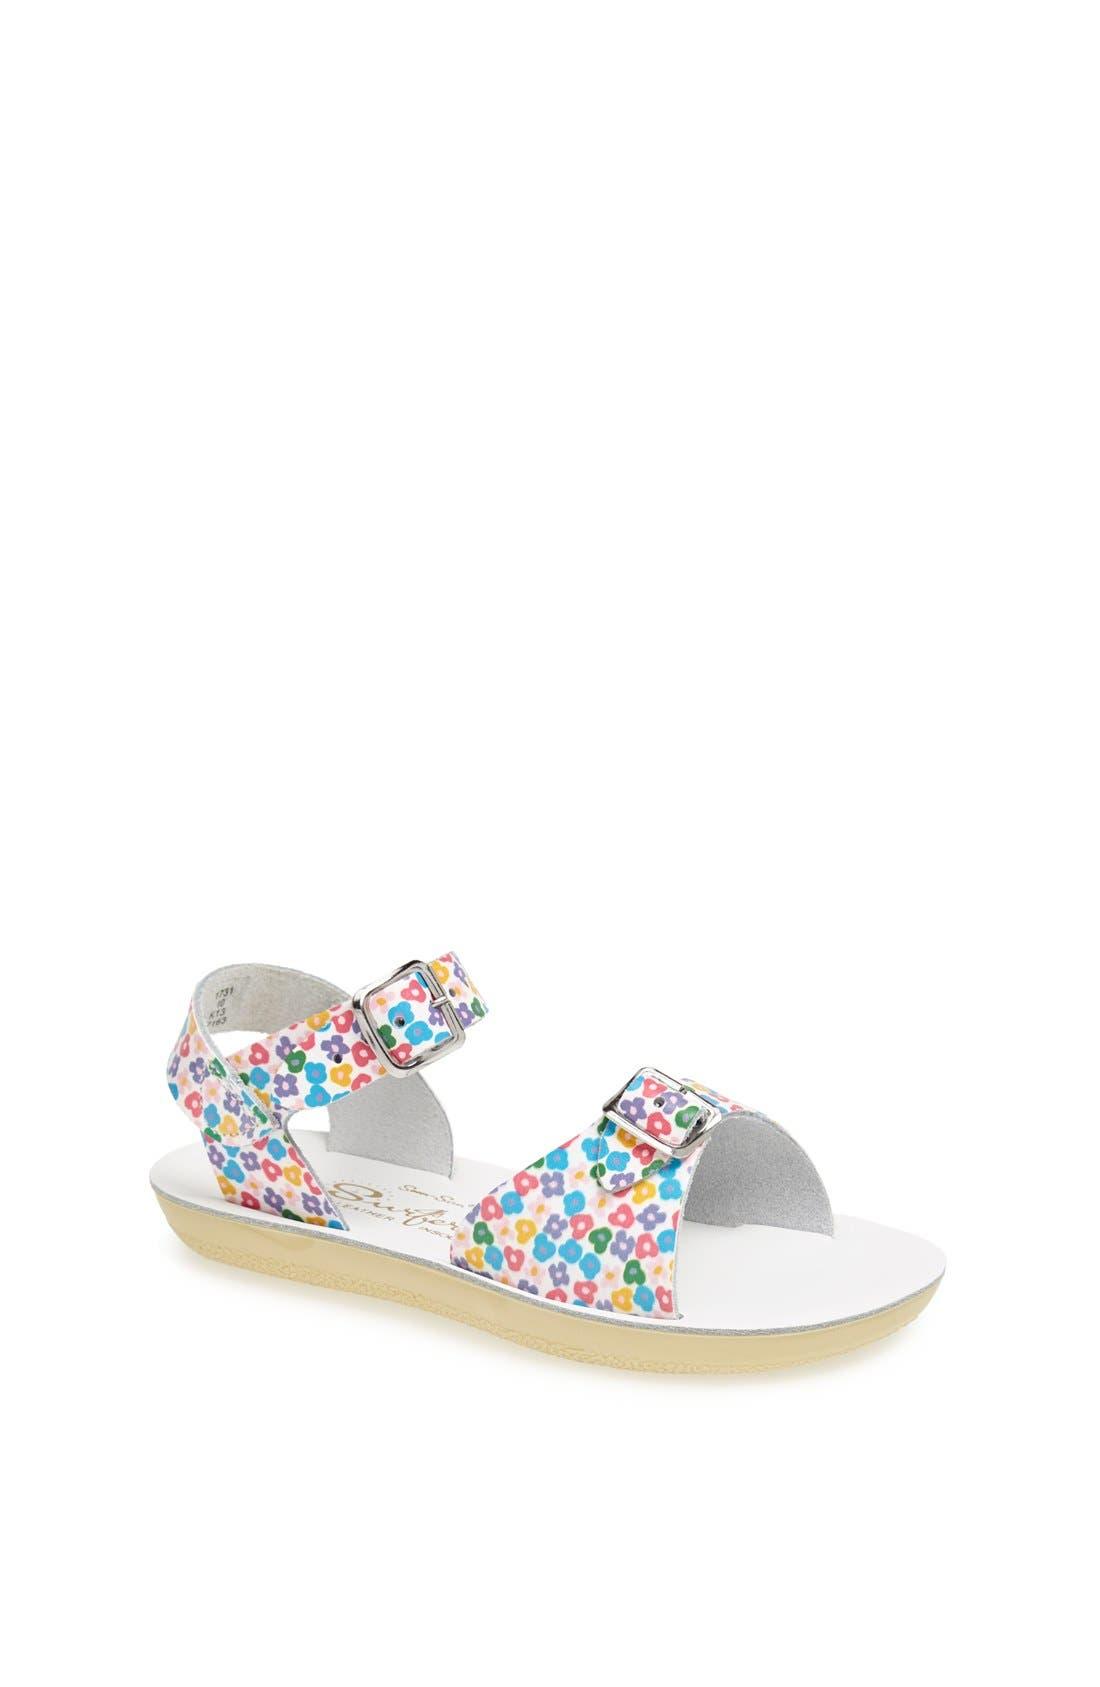 Main Image - Salt Water Sandals by Hoy Shoe Company 'Floral Surfer' Sandal (Toddler)